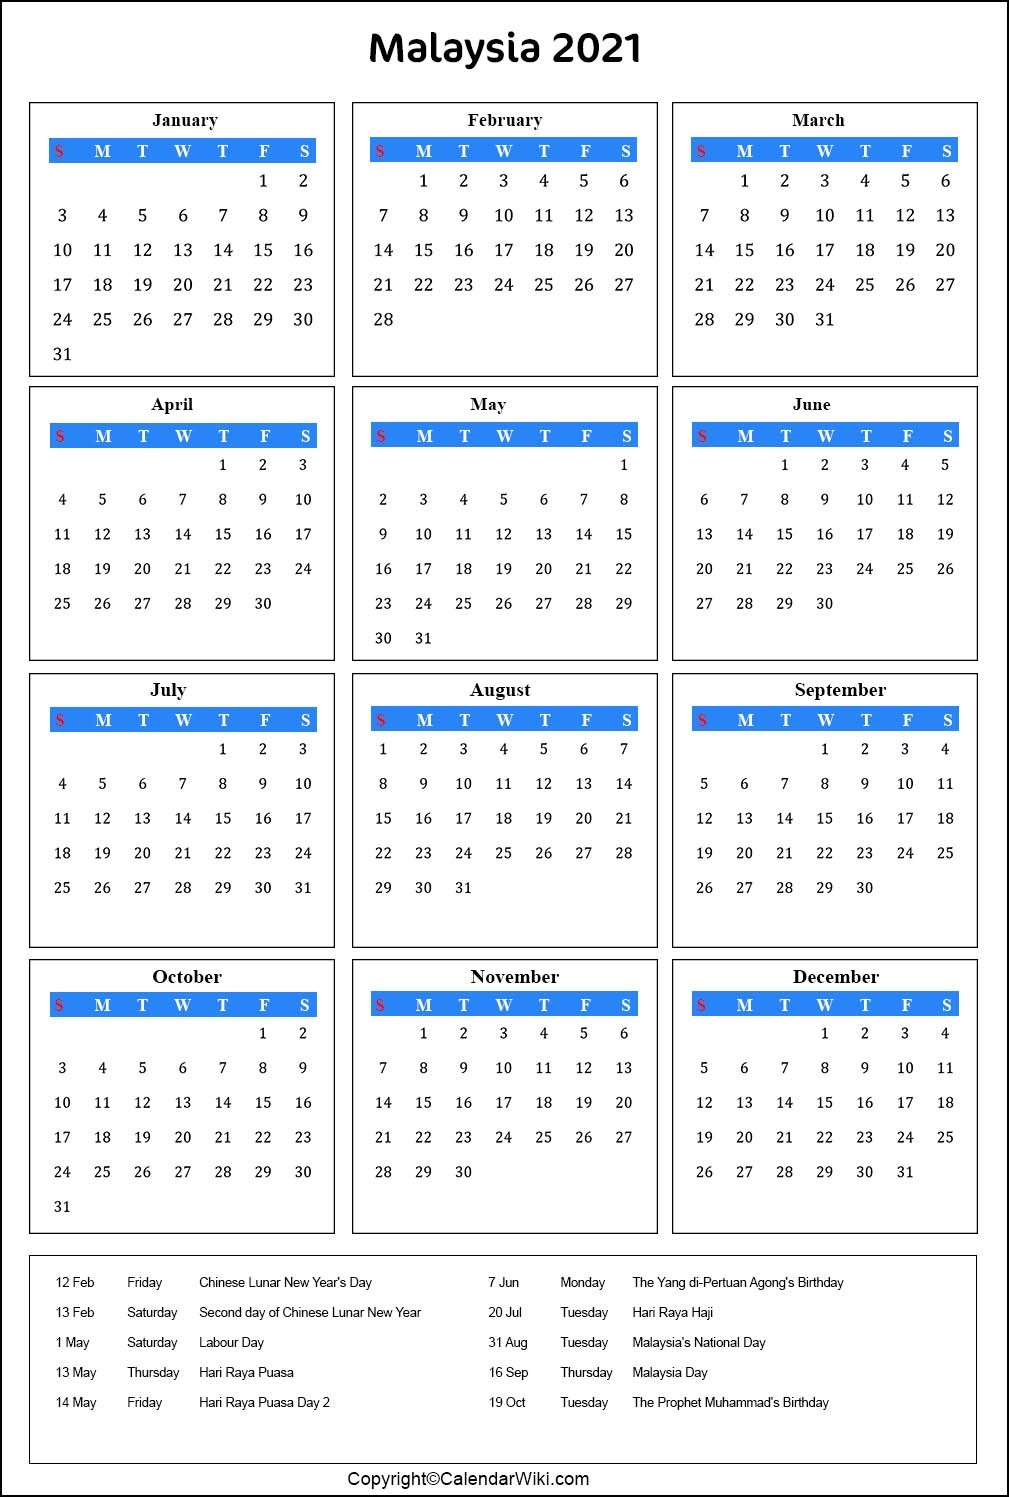 Sarawak Almanac 2021 Pdf | Calendar Template Printable